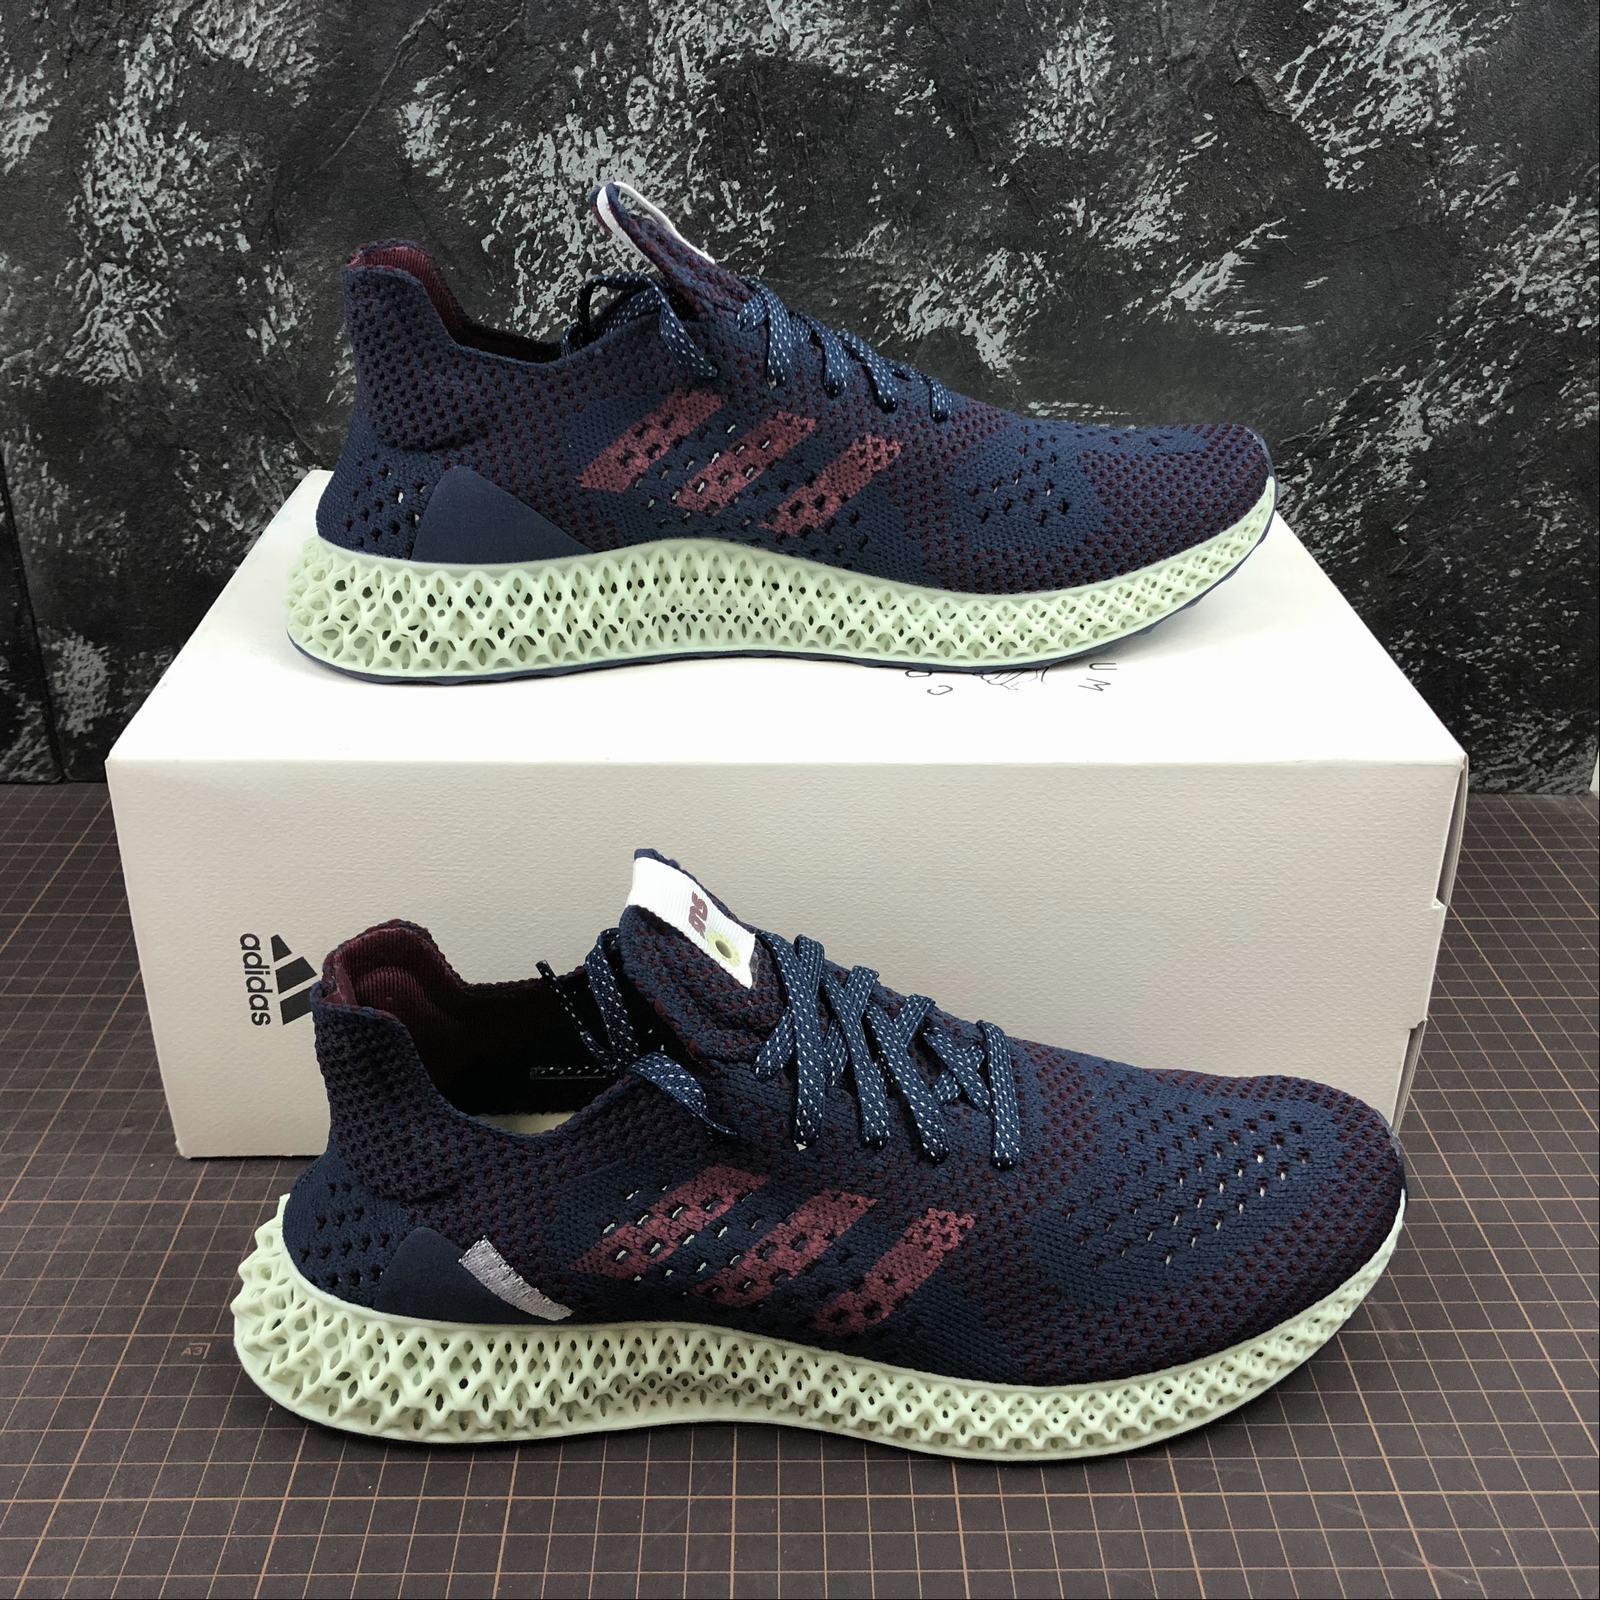 giay-sneaker-adidas-consortium-runner-sns-4d-ac8486